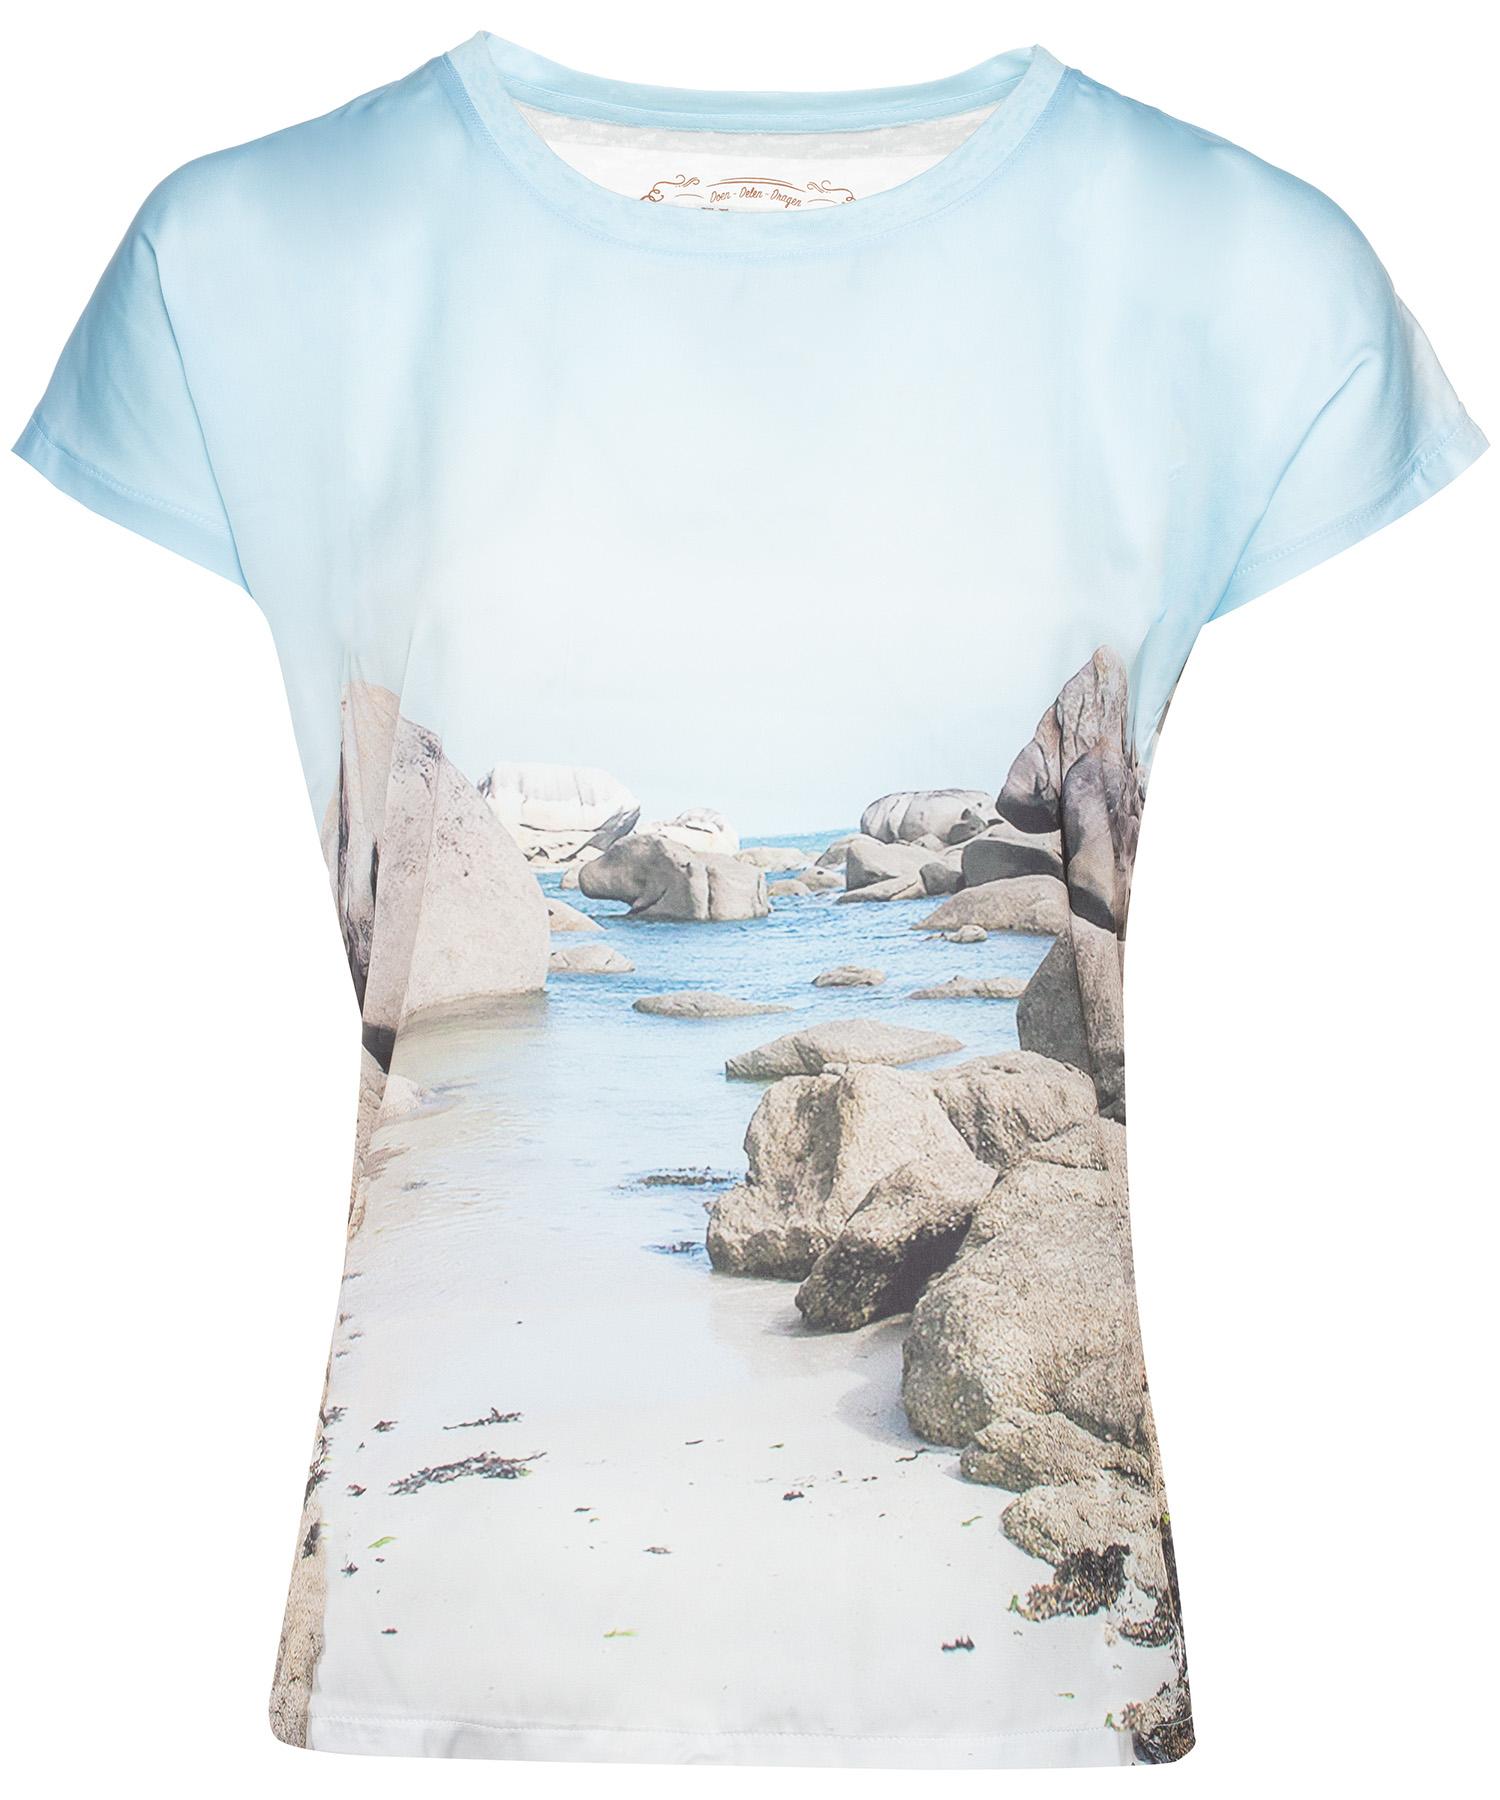 Dividere shirt 'Village de Meneham'